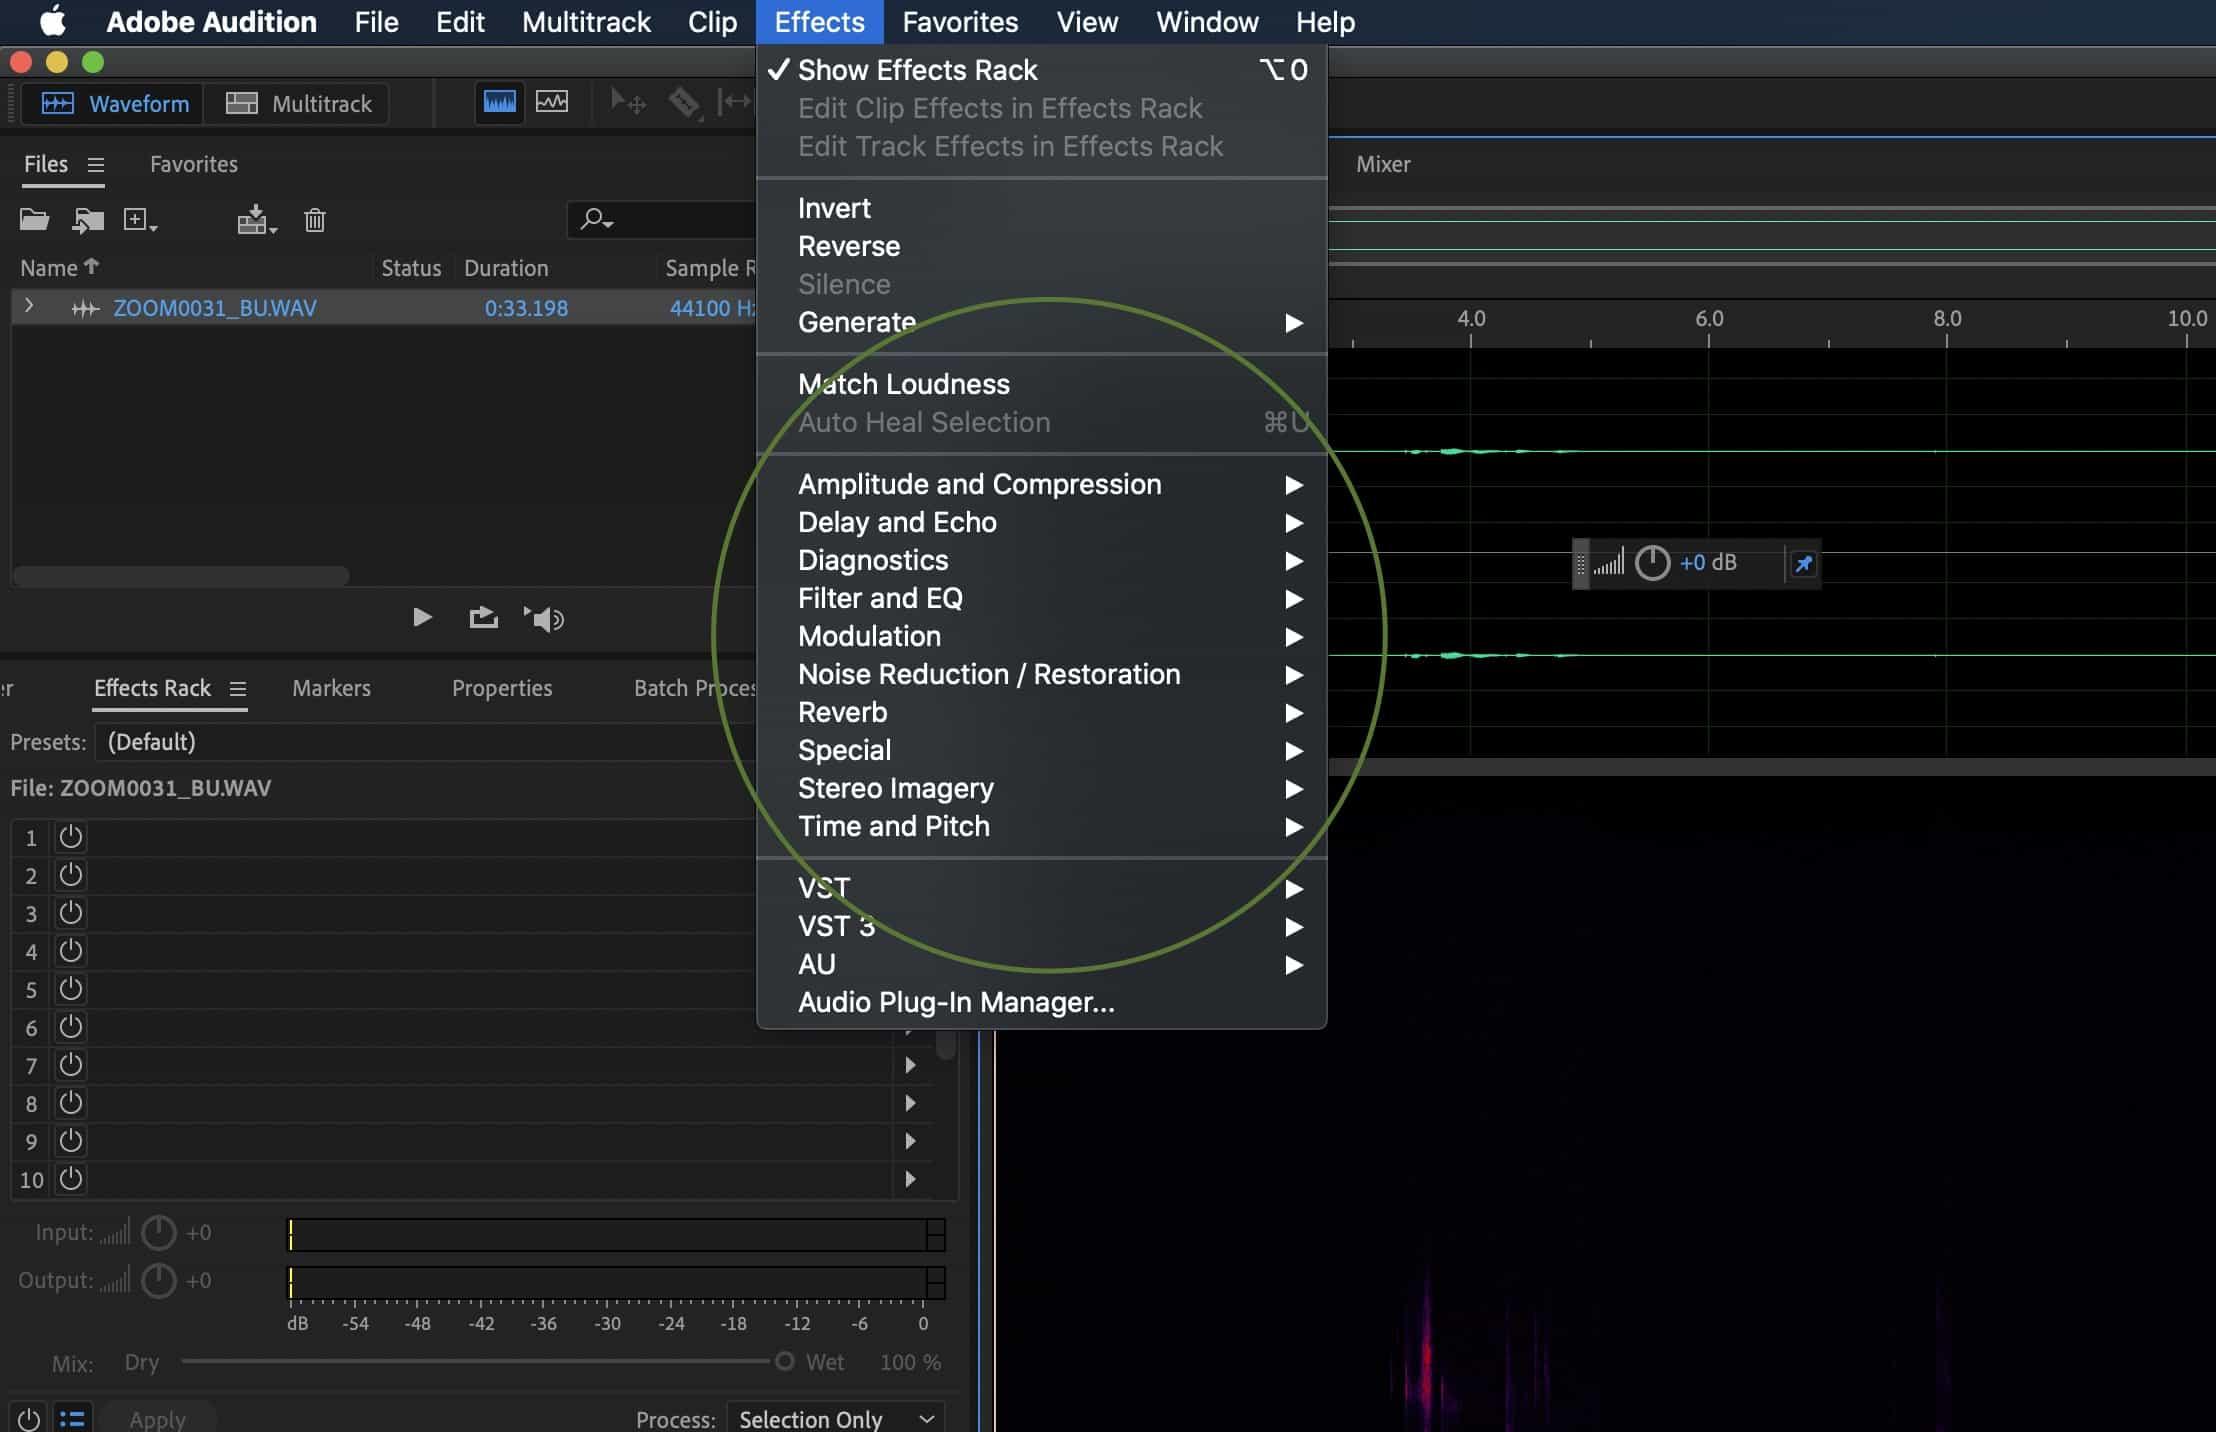 Adobe Audition CC For Beginners – Waveform vs Multitrack